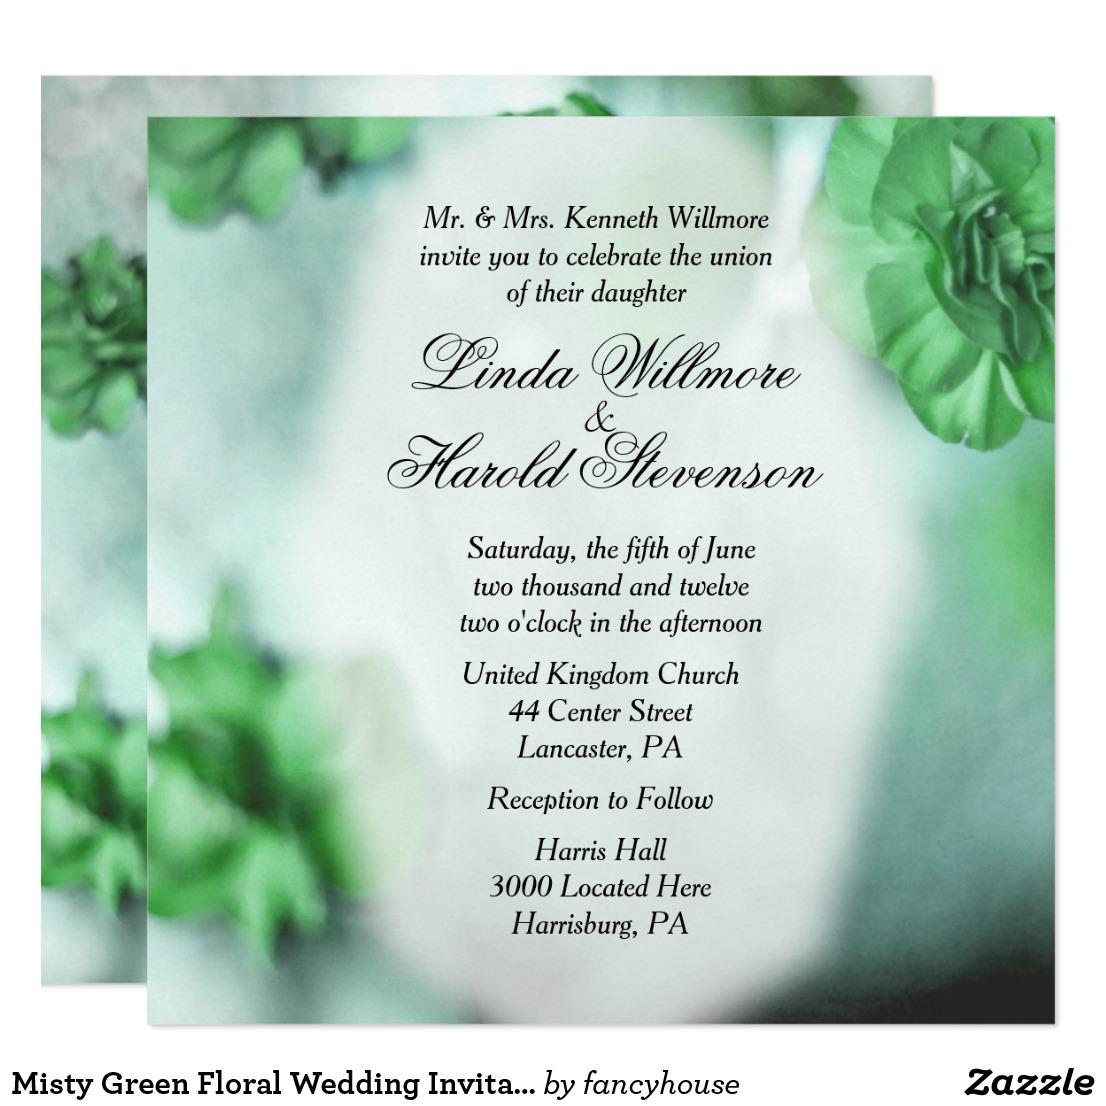 Misty Green Floral Wedding Invitations